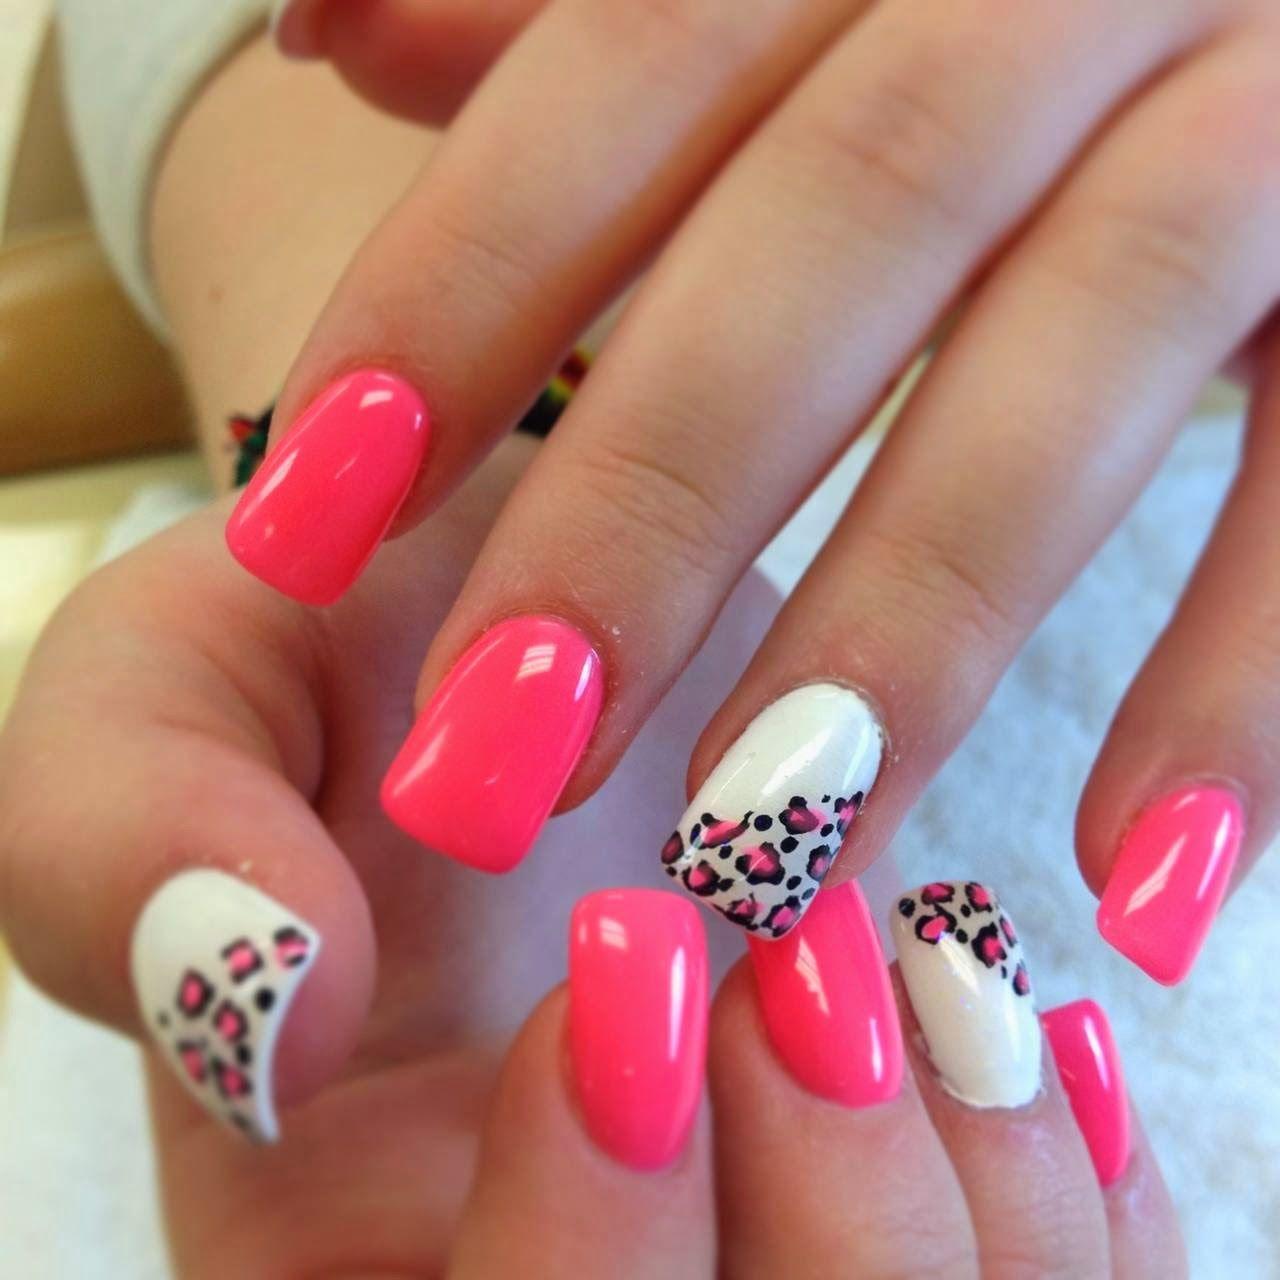 Pin by Elva Mitchell on Beautiful!!! Nails. | Pinterest | Summer ...